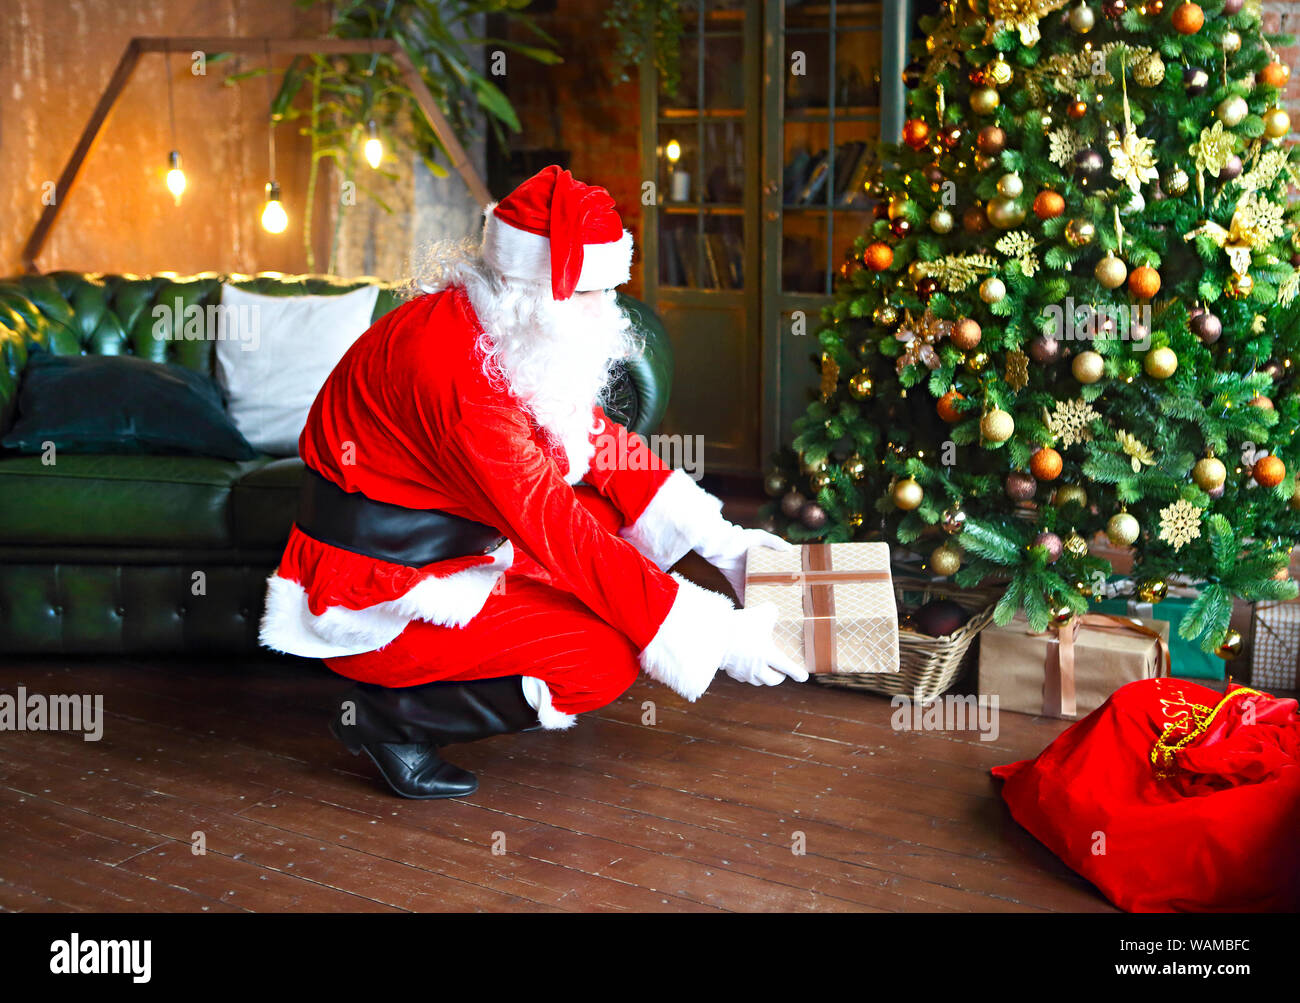 Santa Claus secretly putting gift boxes under the Christmas tree. Xmas Stock Photo